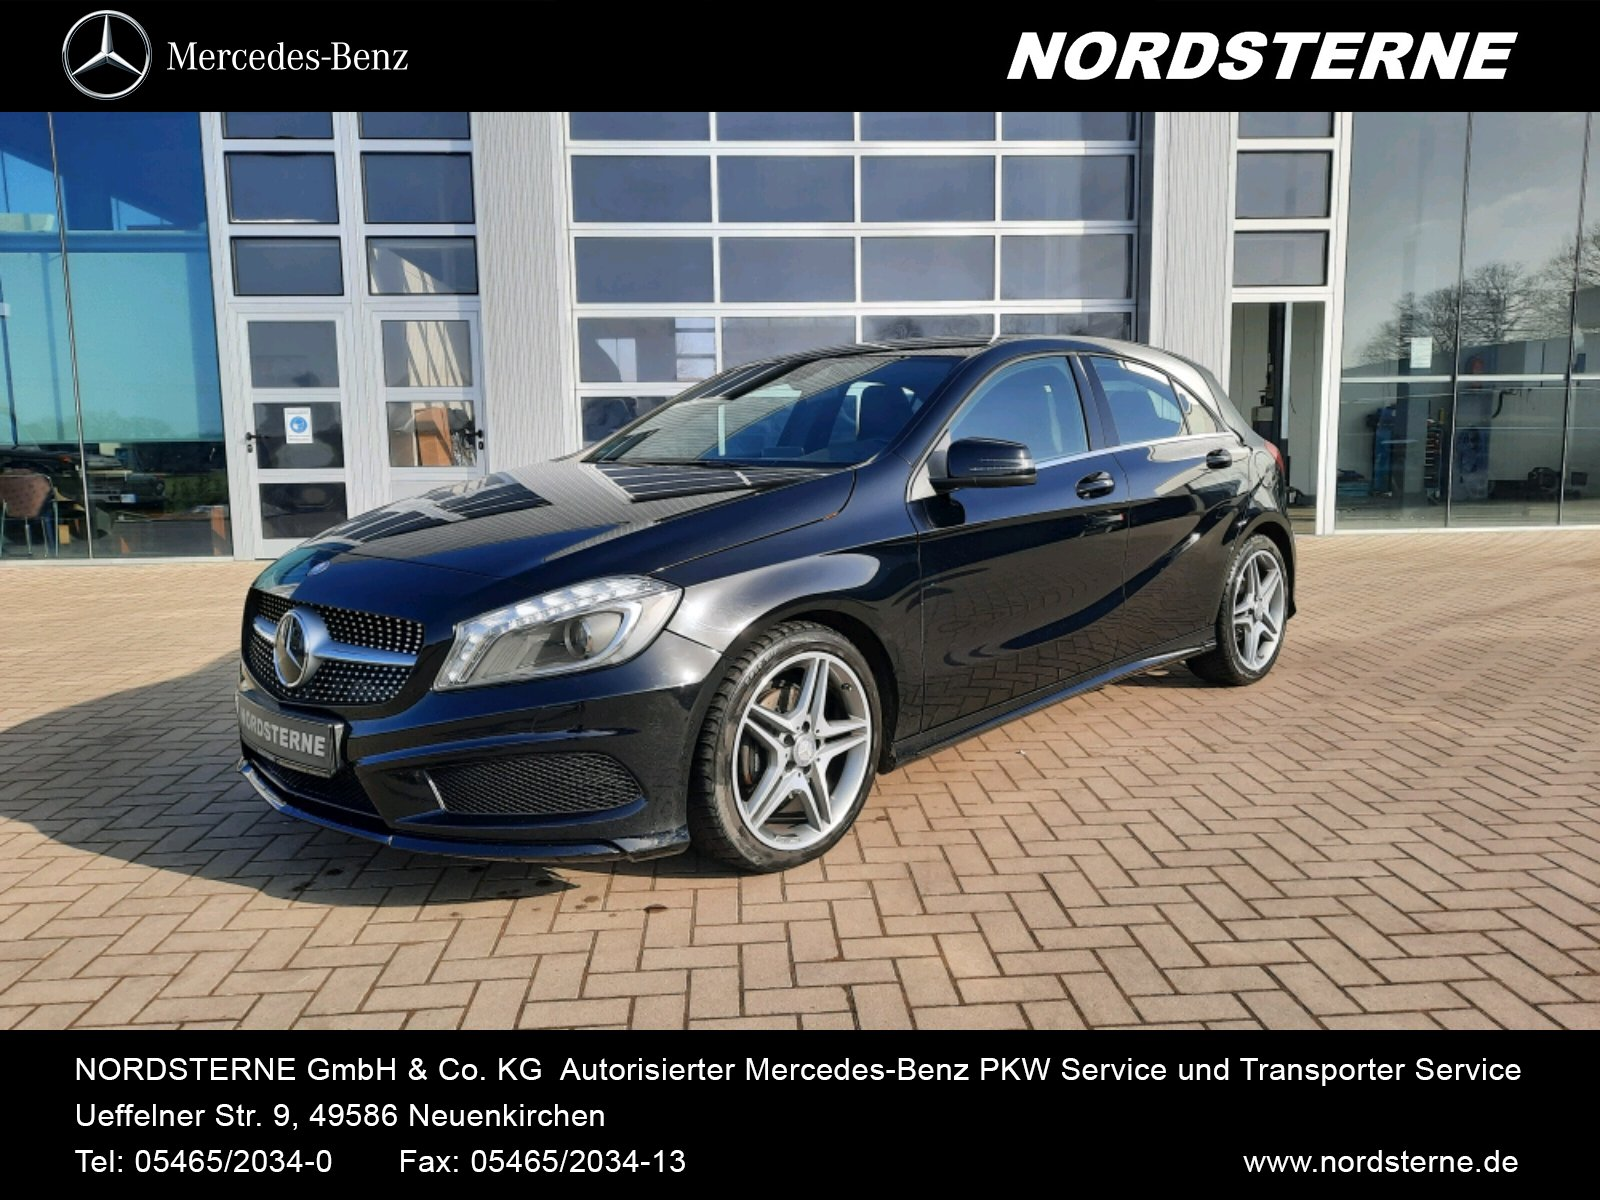 Mercedes-Benz A 200 CDI Street Style+AMG-LINE+BI-XENON+NAVI BC, Jahr 2015, Diesel